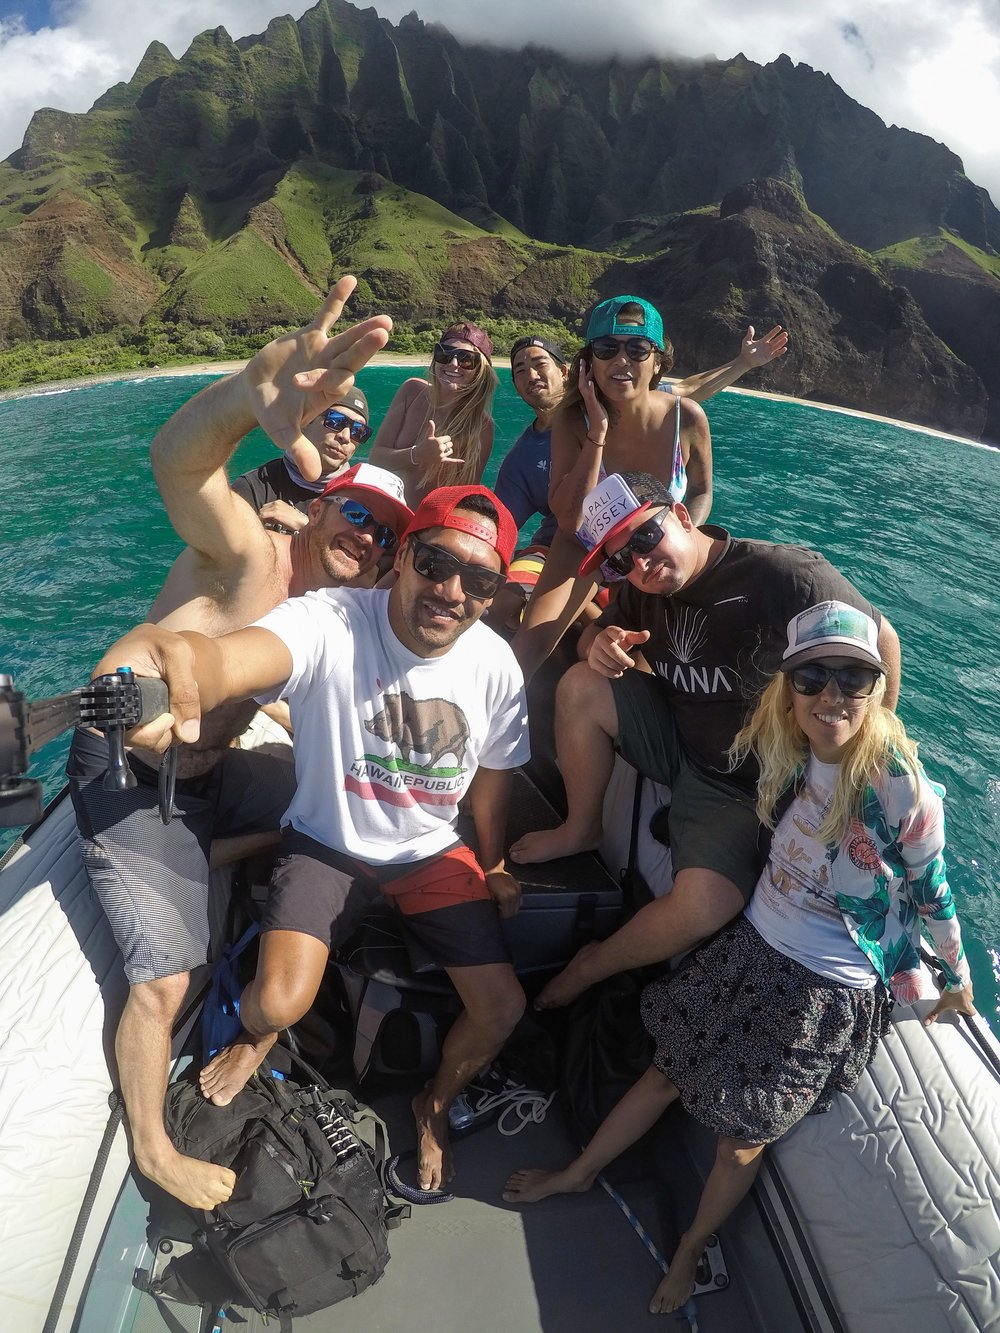 Crew love. Book a Na Pali coast tour with @NapaliOdyssey